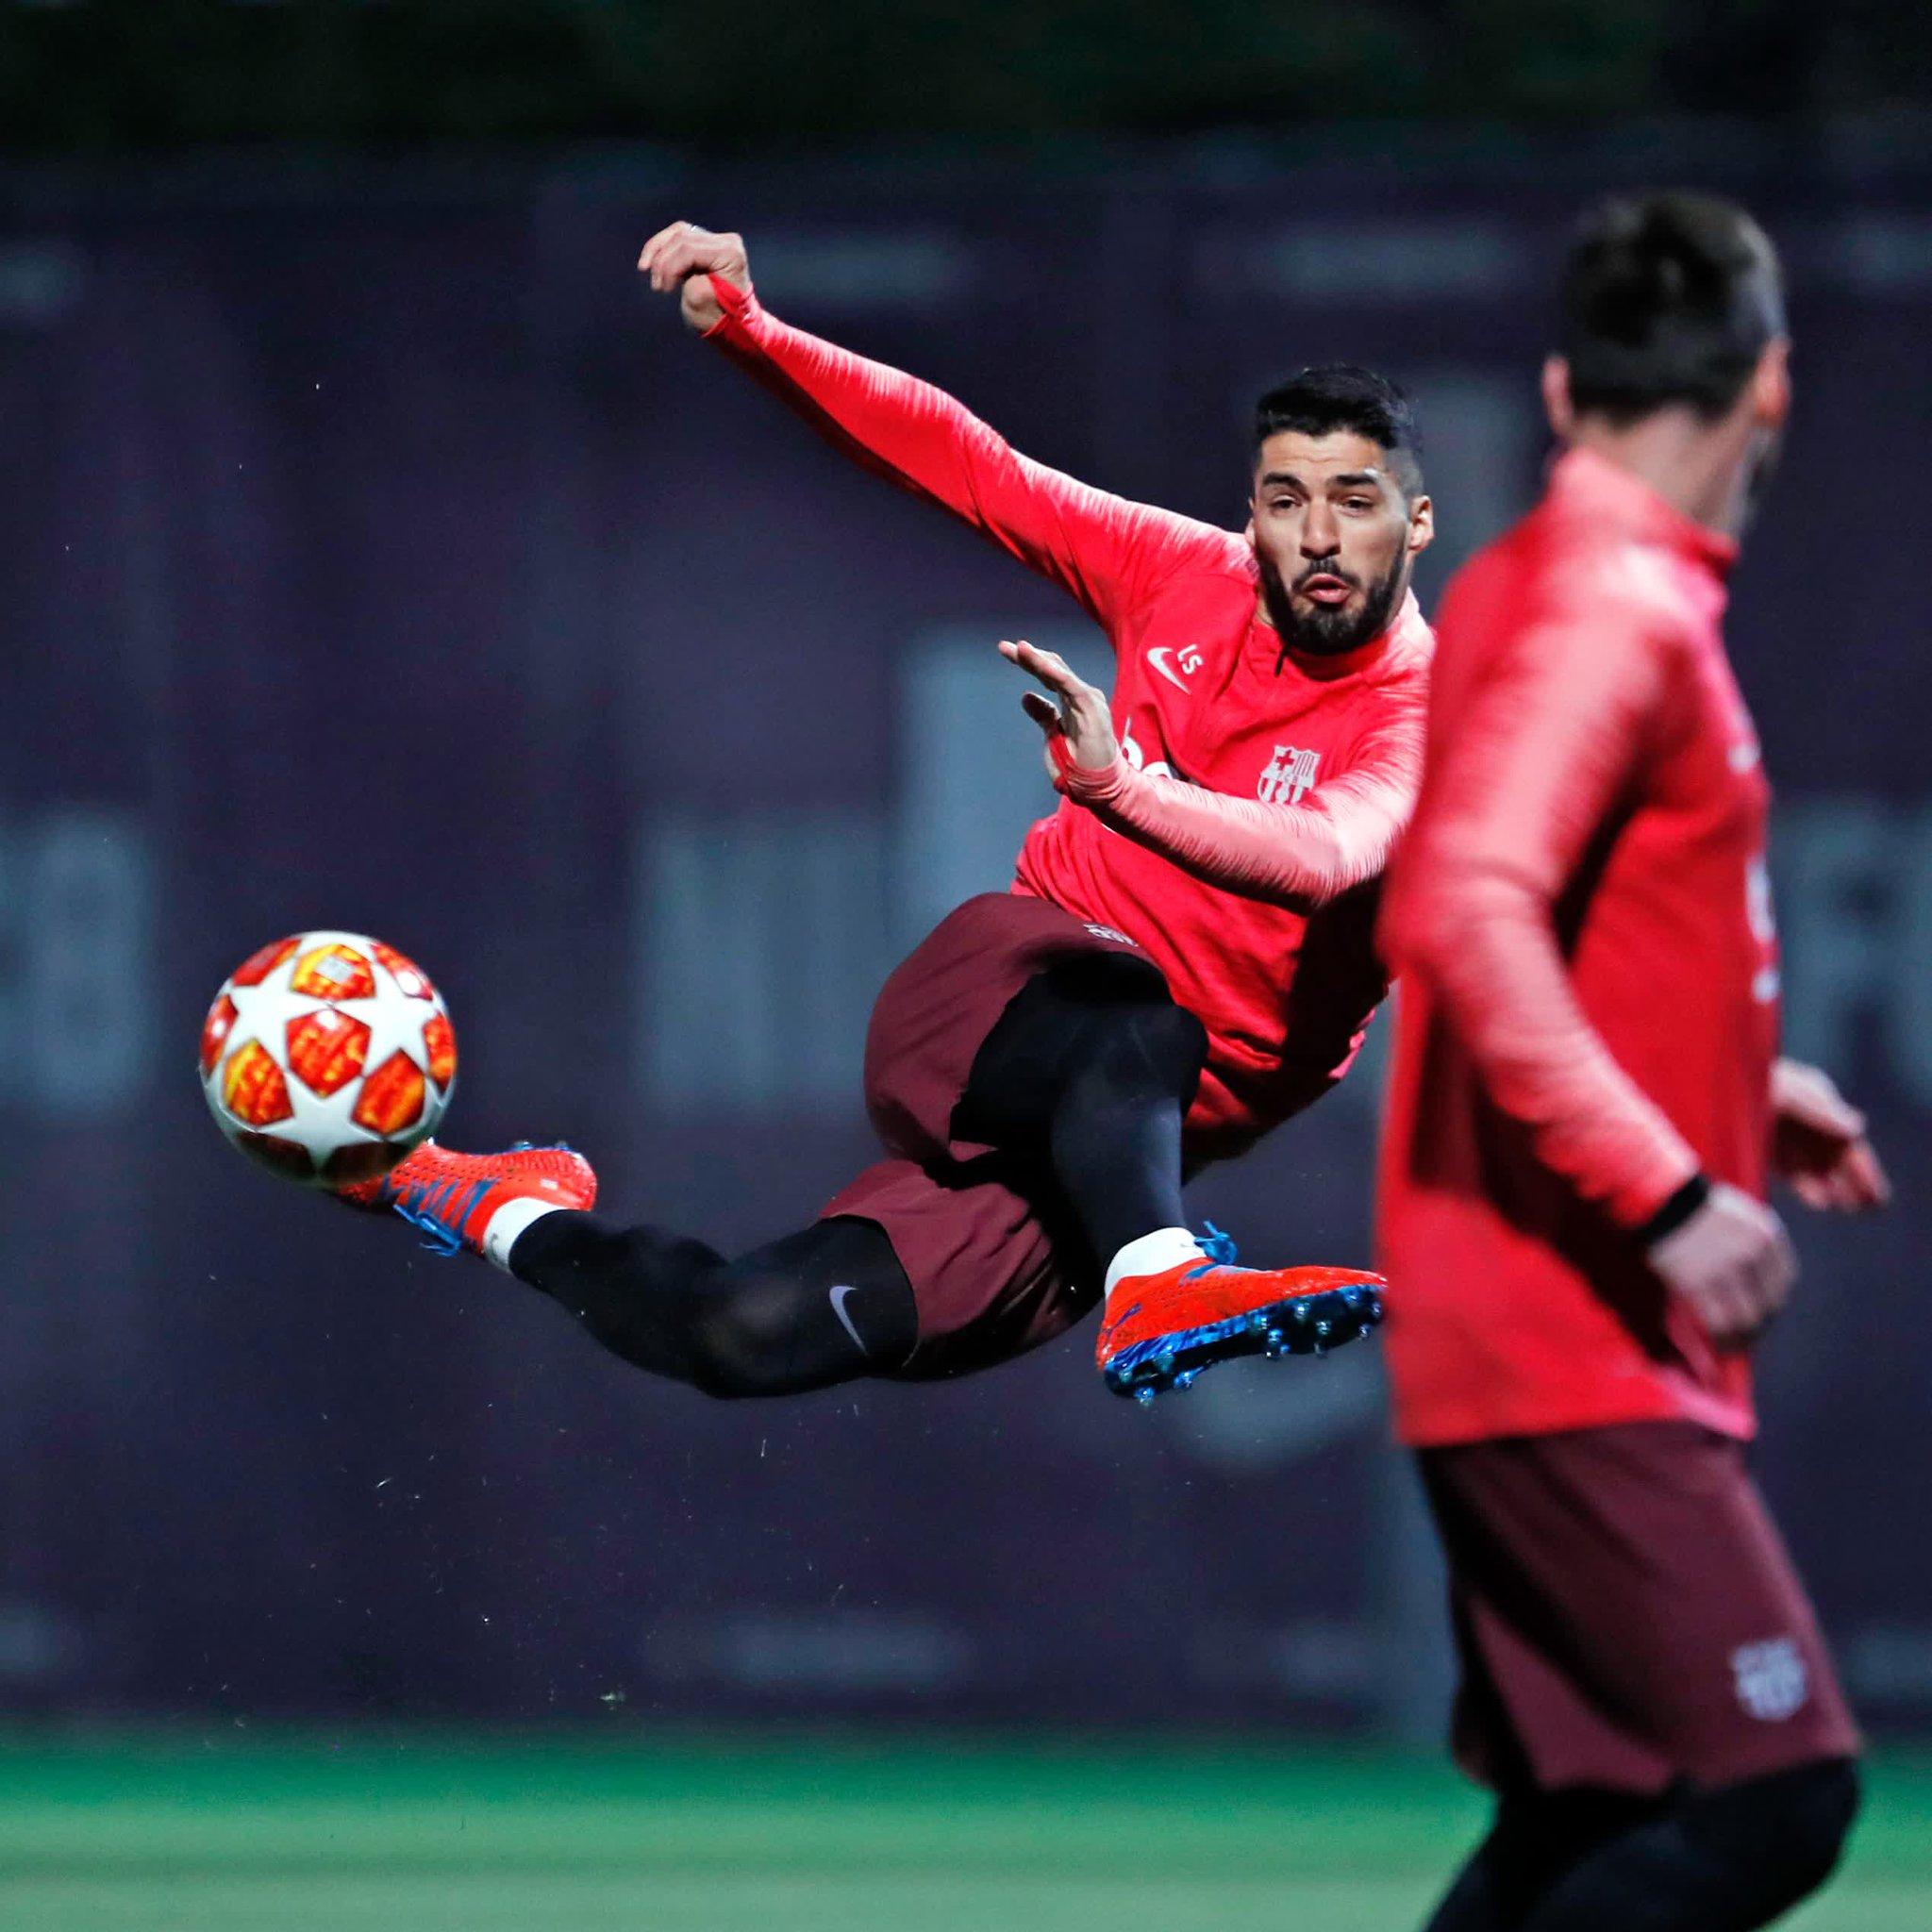 ��  #BarçaOL ⚽️ �� @ChampionsLeague  �� Let's do this!  ���� Força Barça! https://t.co/pNkwuAljkc